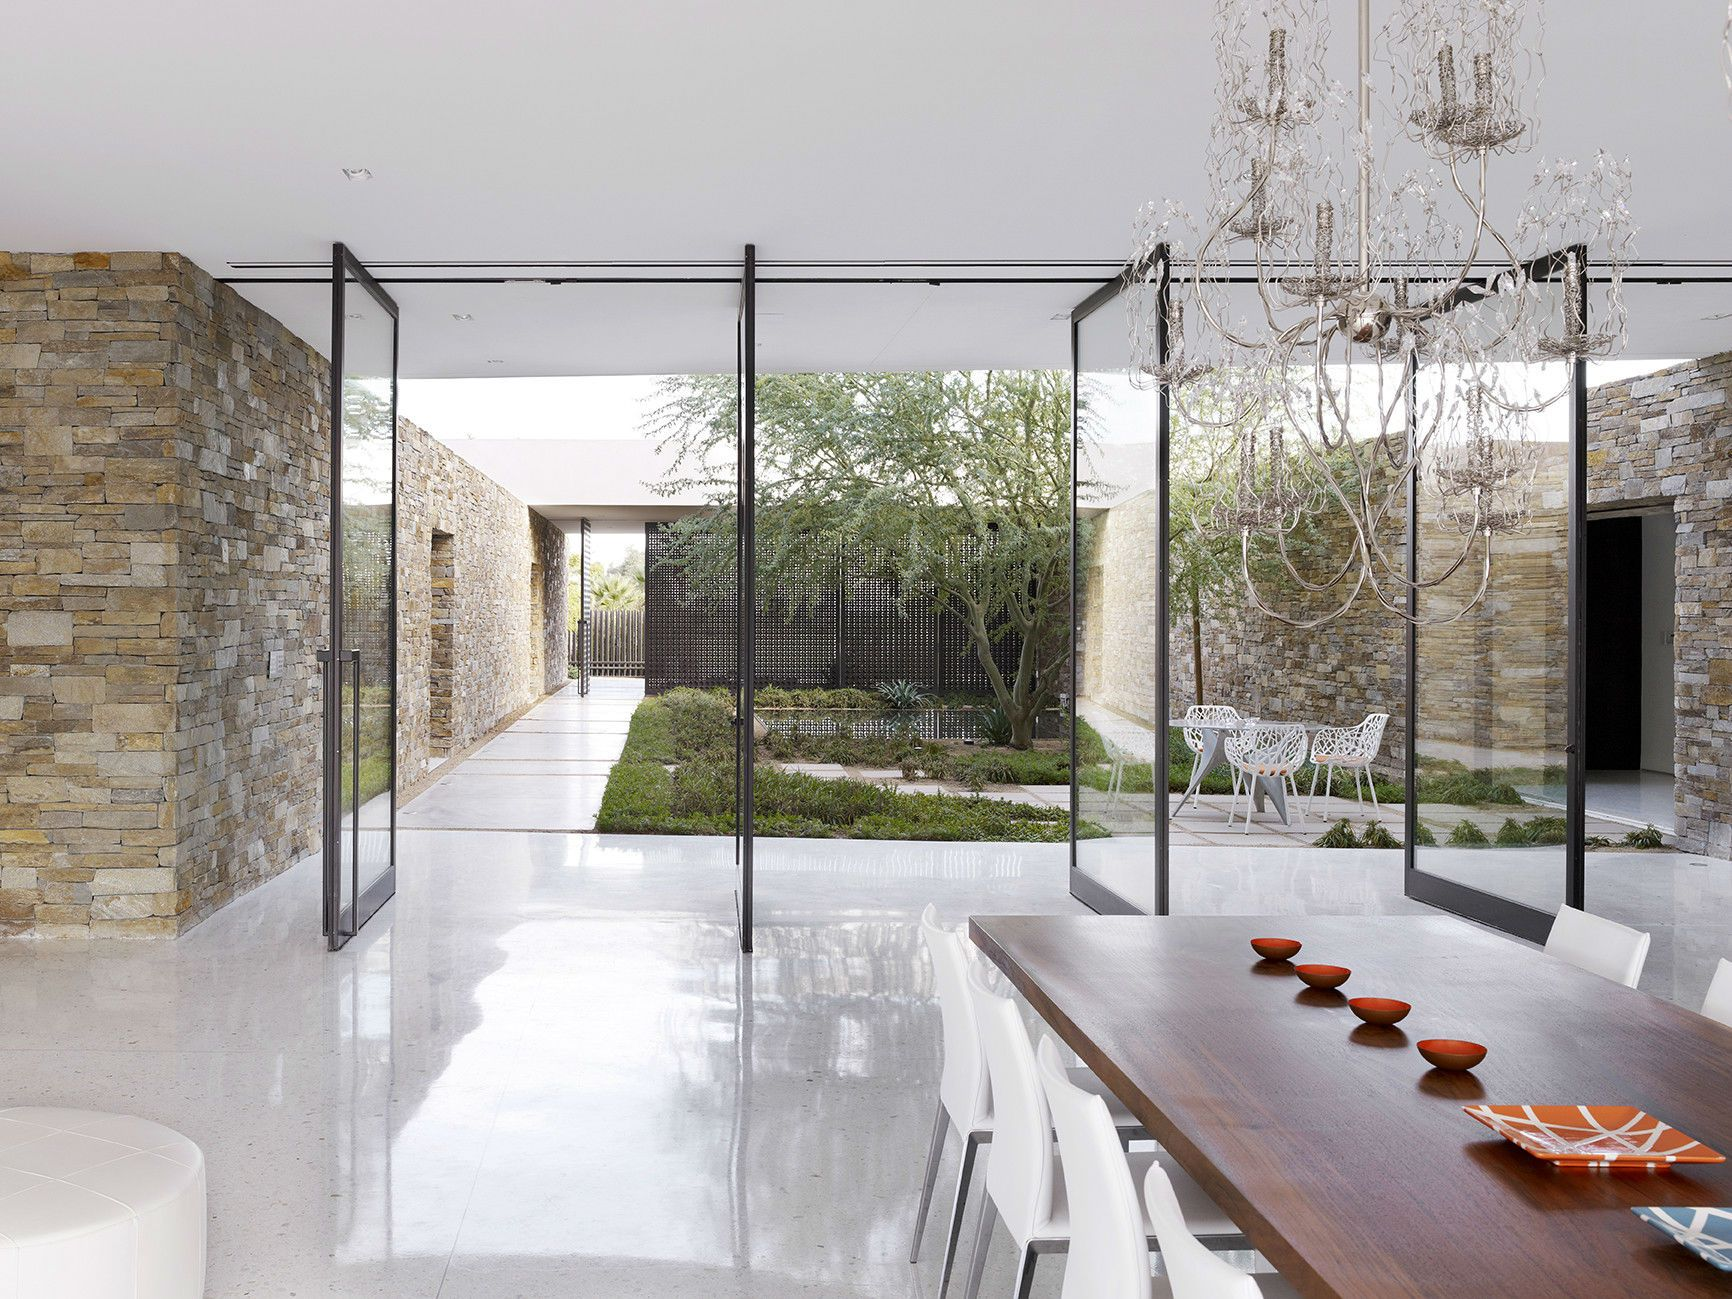 Madison House | XTEN Architecture - Arch2O.com